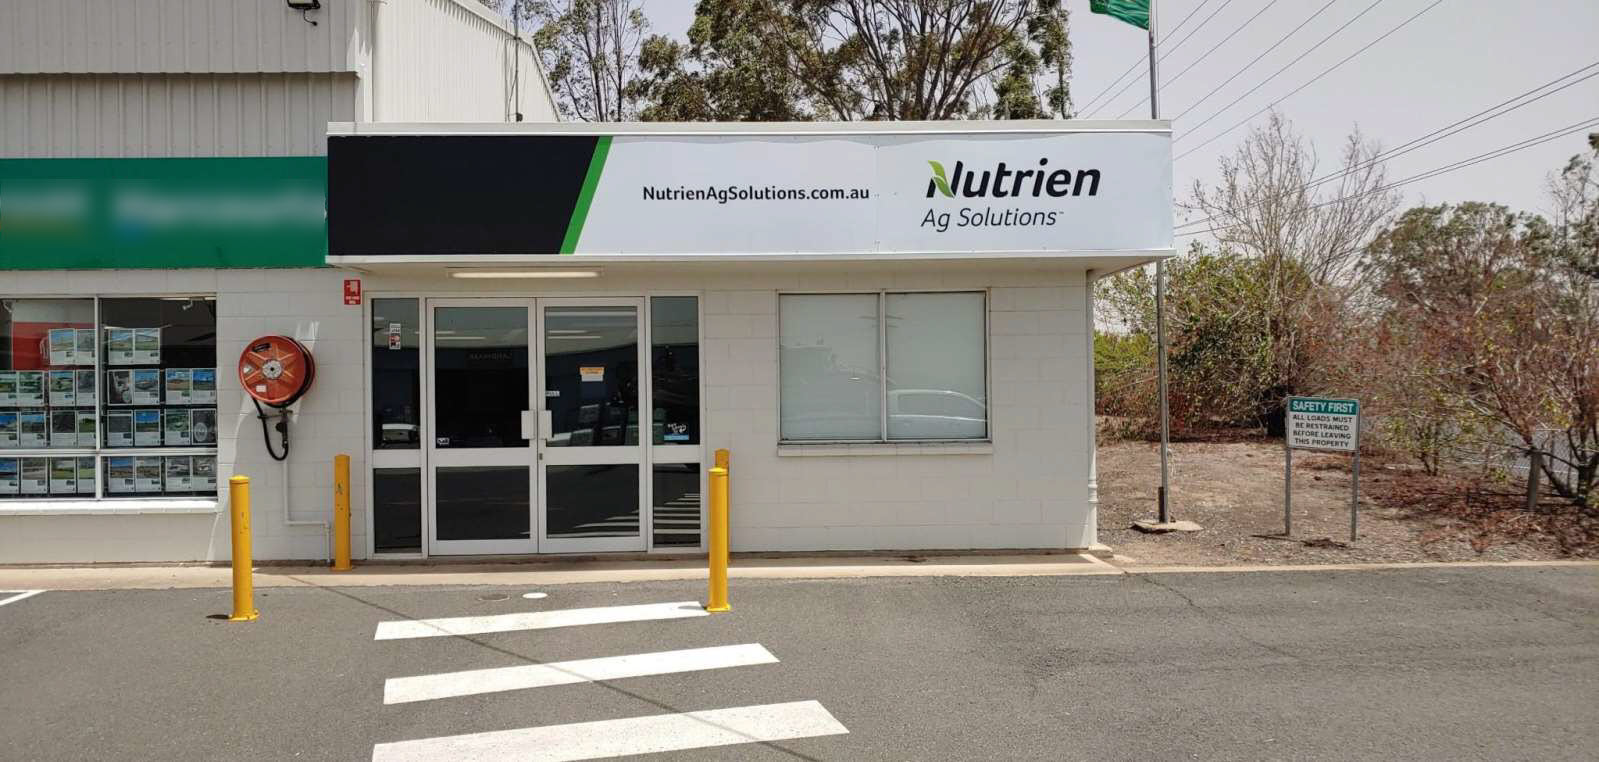 Nutrien Ag Solutions - Gatton, QLD 4343 - (07) 5462 4401   ShowMeLocal.com